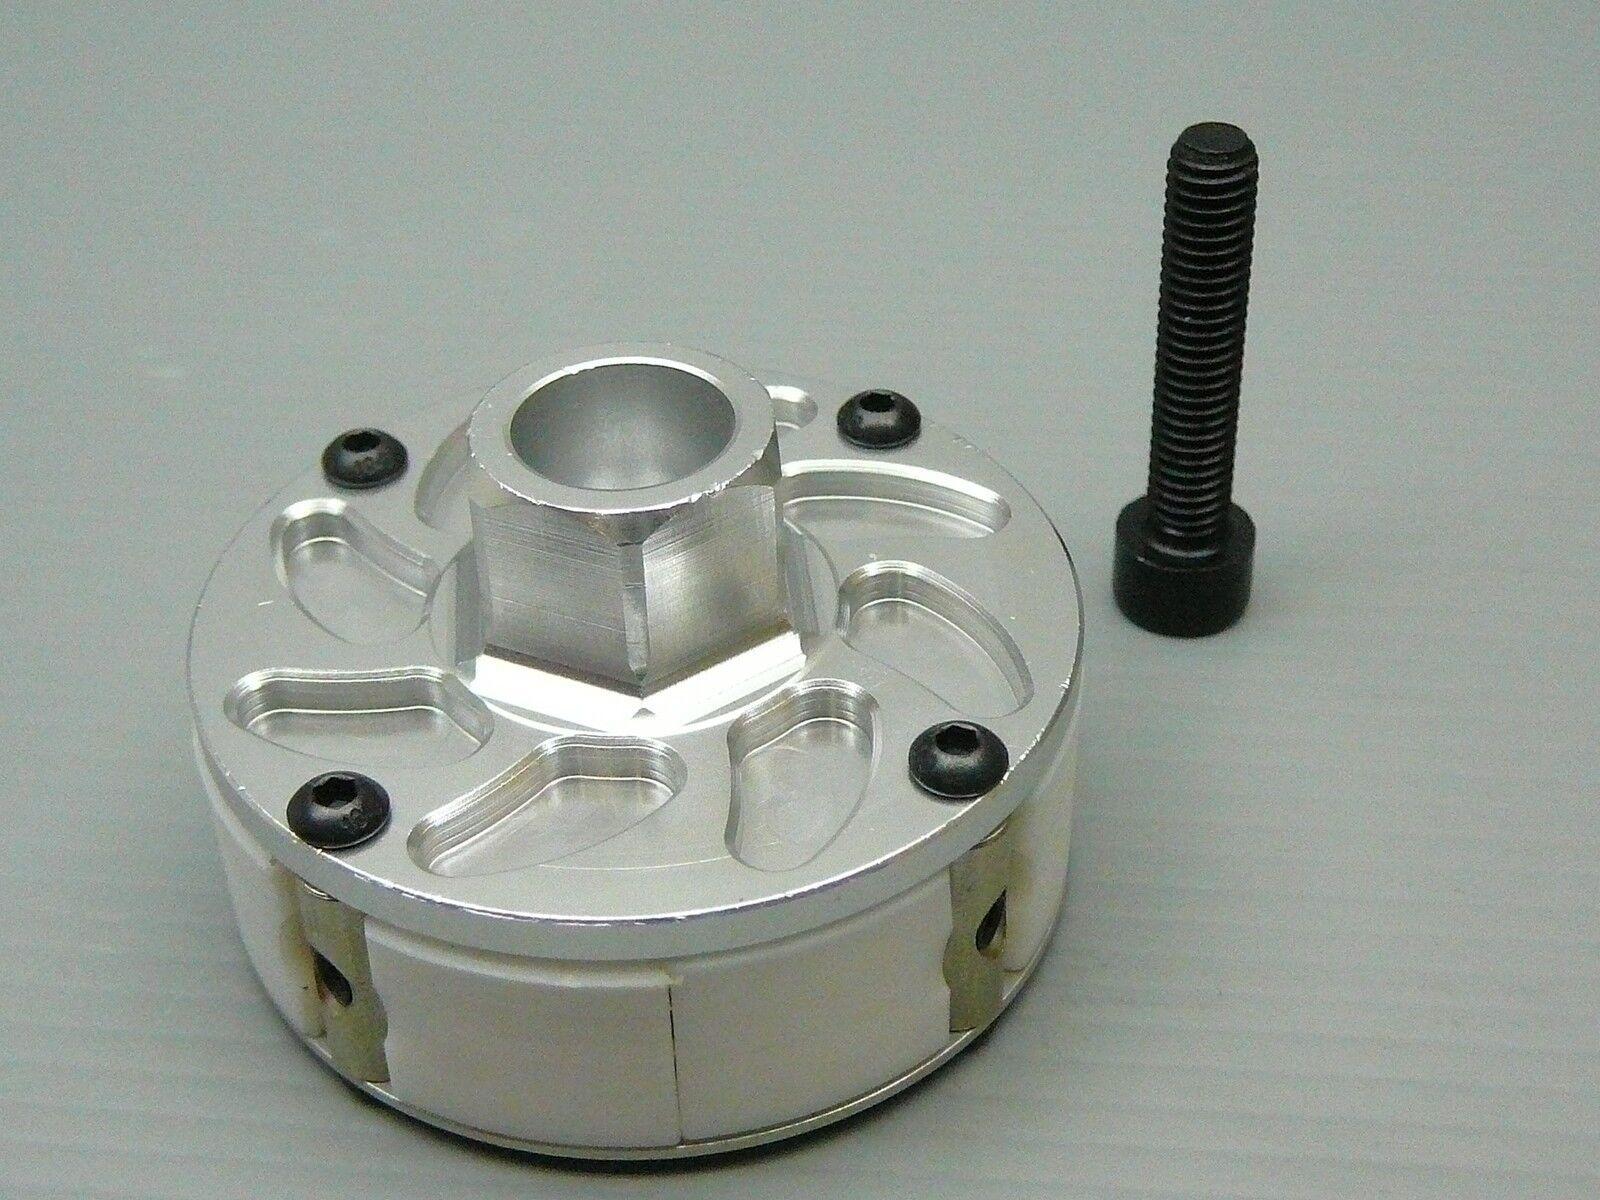 Vxp einstellbare racing 4 schuh kupplung 1   5 gas hpi baja 5b 5ive fg losi km